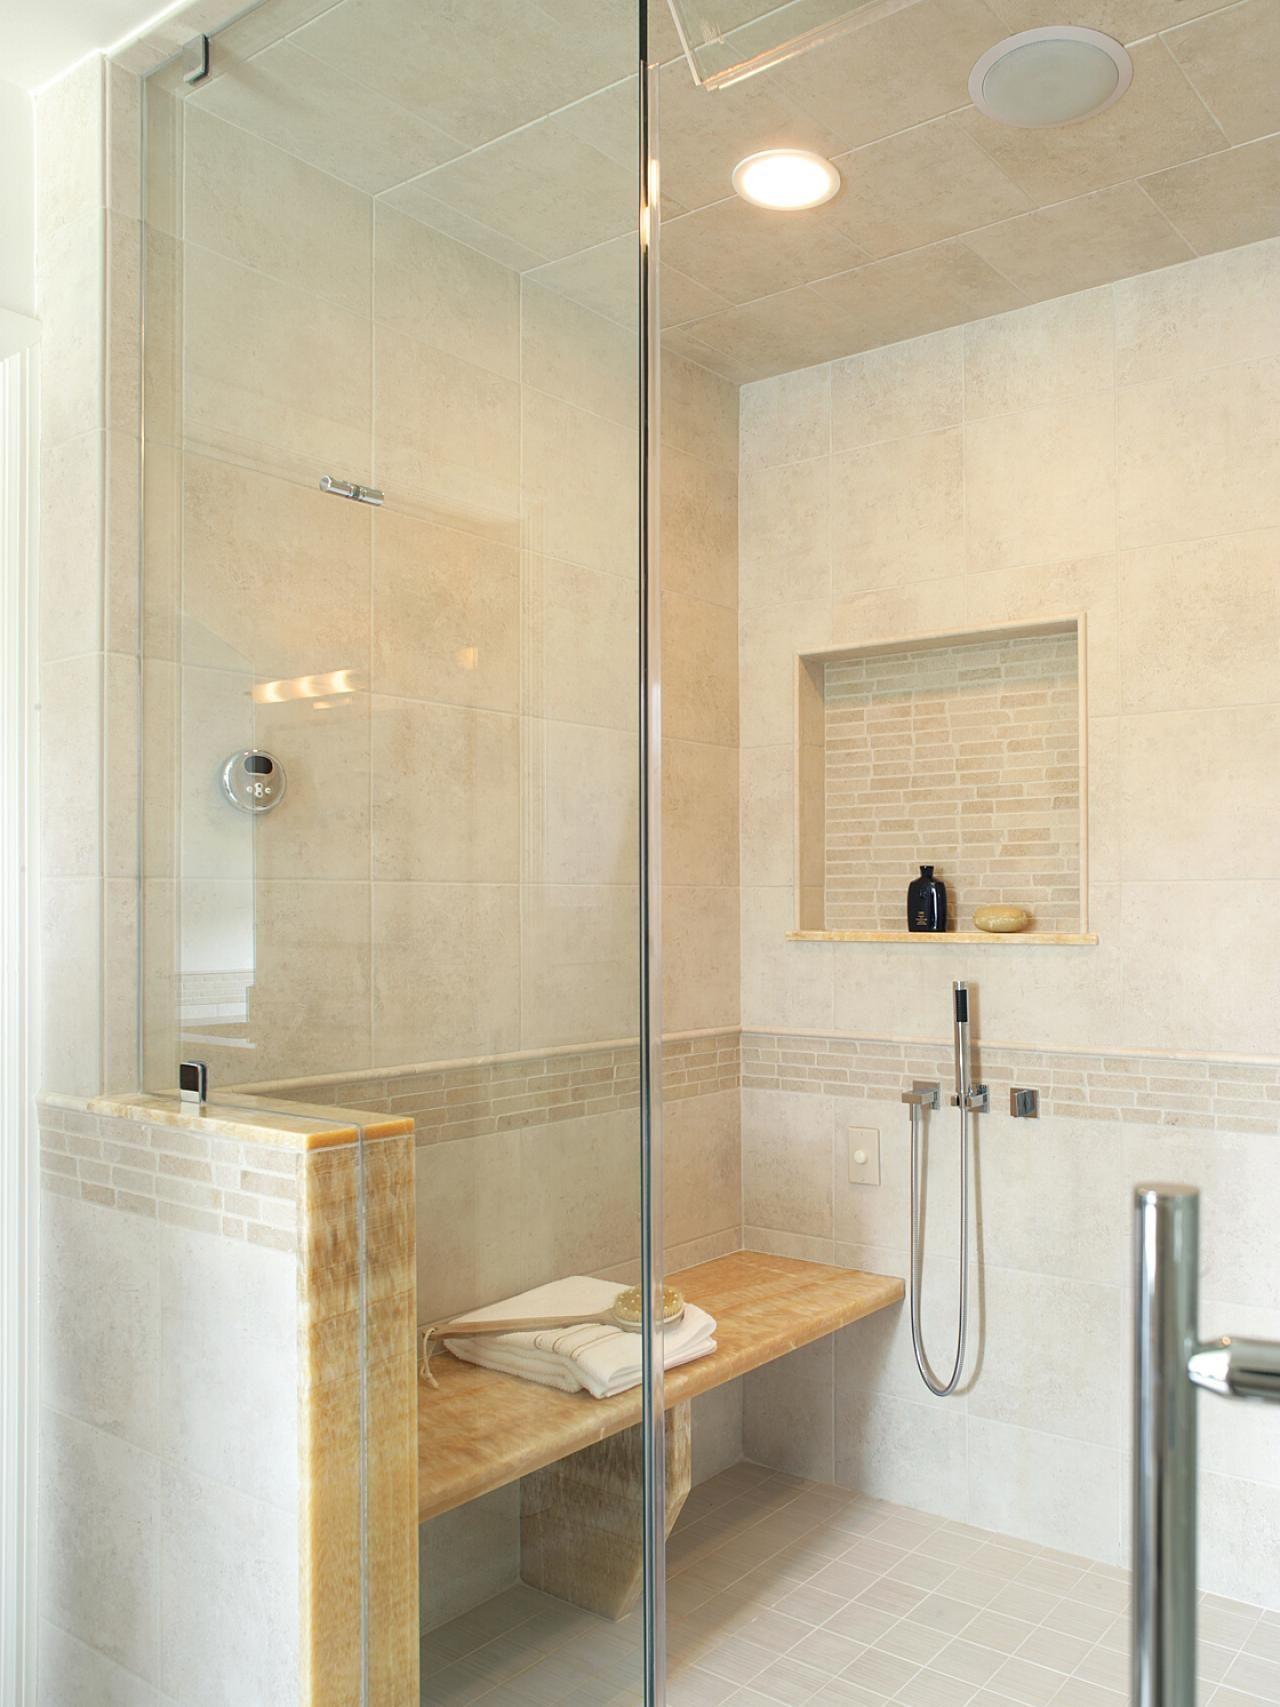 ADACompliant Bathroom Layouts Bath Remodel Bathroom Designs And Hgtv - Ada compliant bathroom remodel